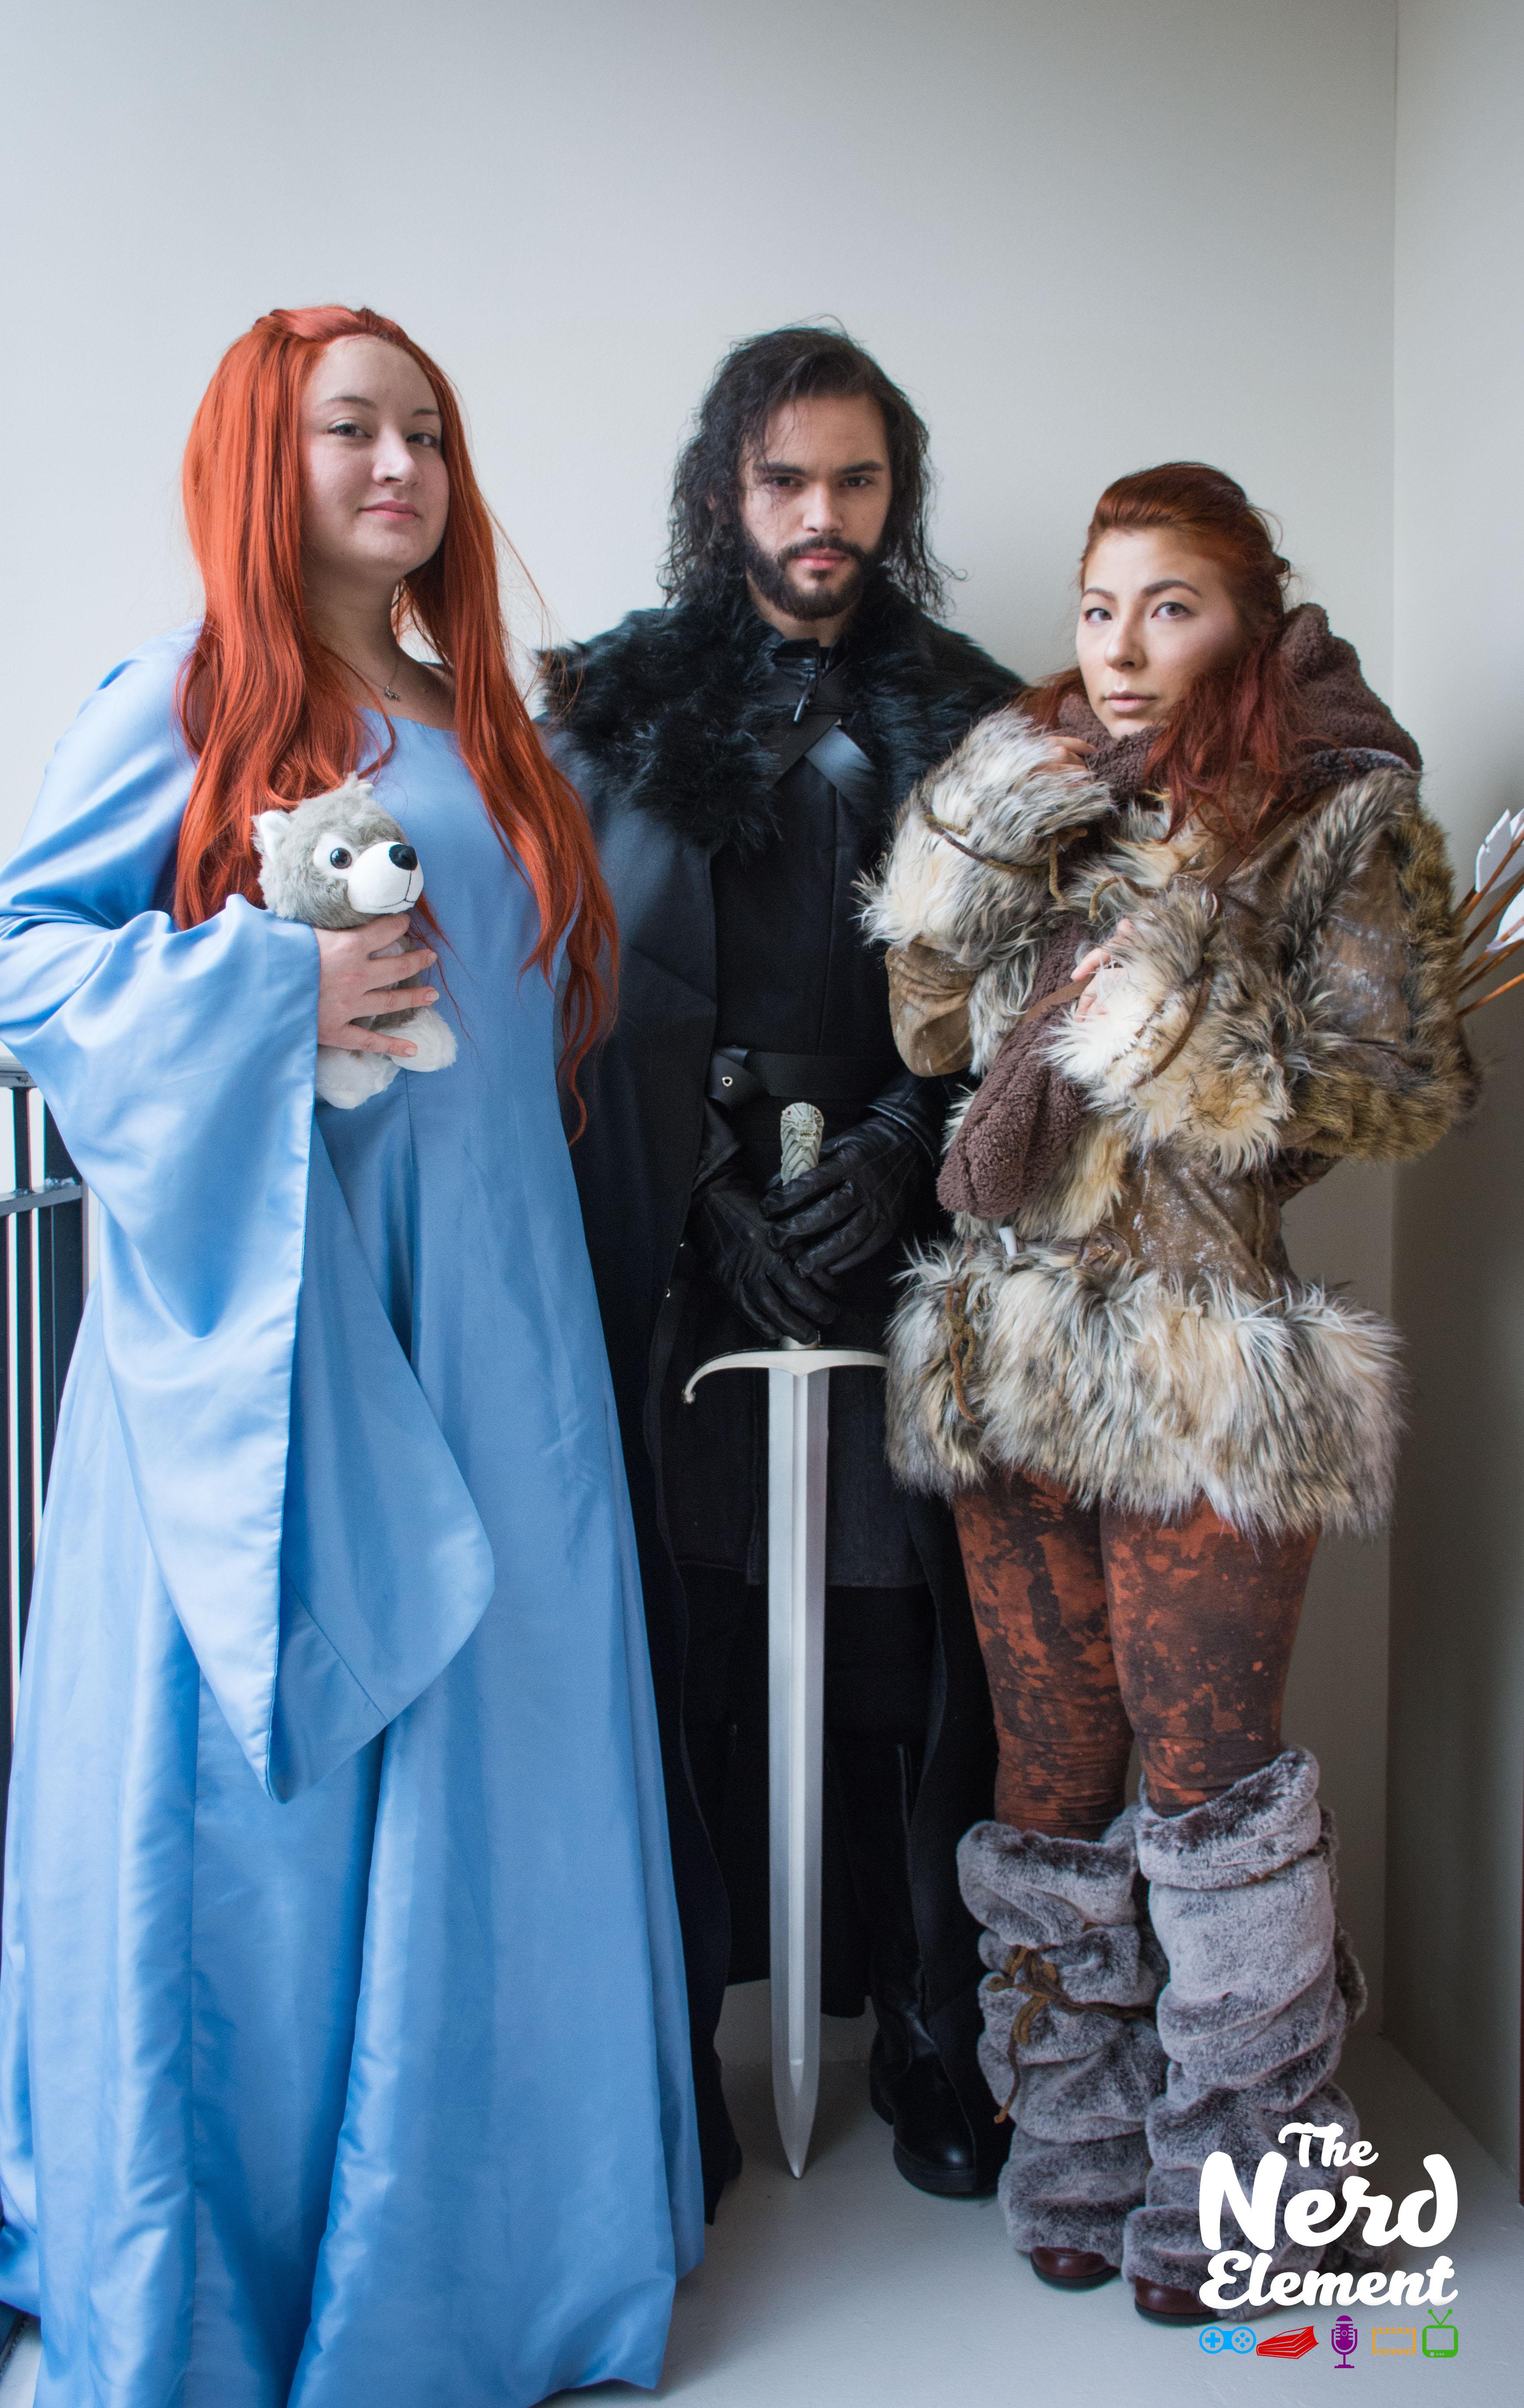 Sansa, Jon Snow, and Ygritte - Game of Thrones Cosplayers: _autumnhana (ig), kradenine (ig/fb), and inkmonsterdraws (ig/fb)